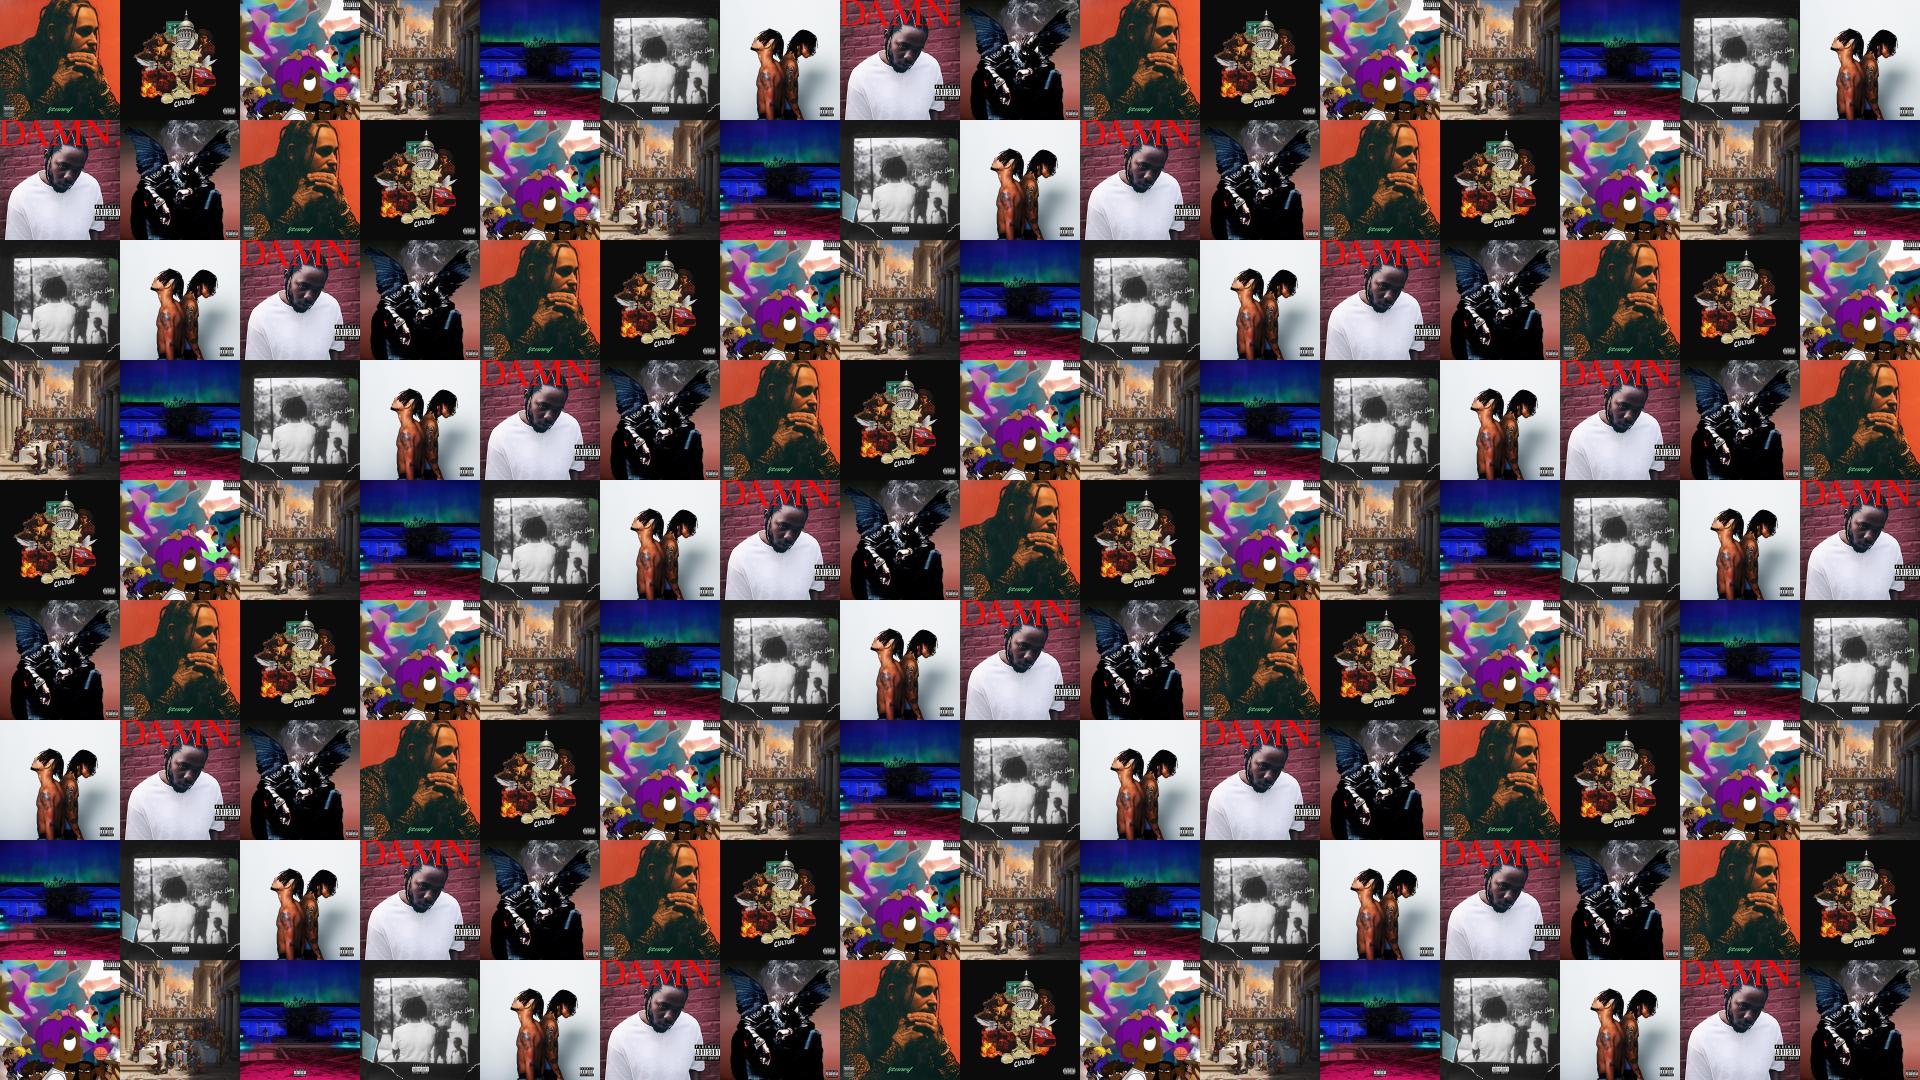 Good Wallpaper Computer Logic - 86416634459120135c43729  Pic_994170 .jpg